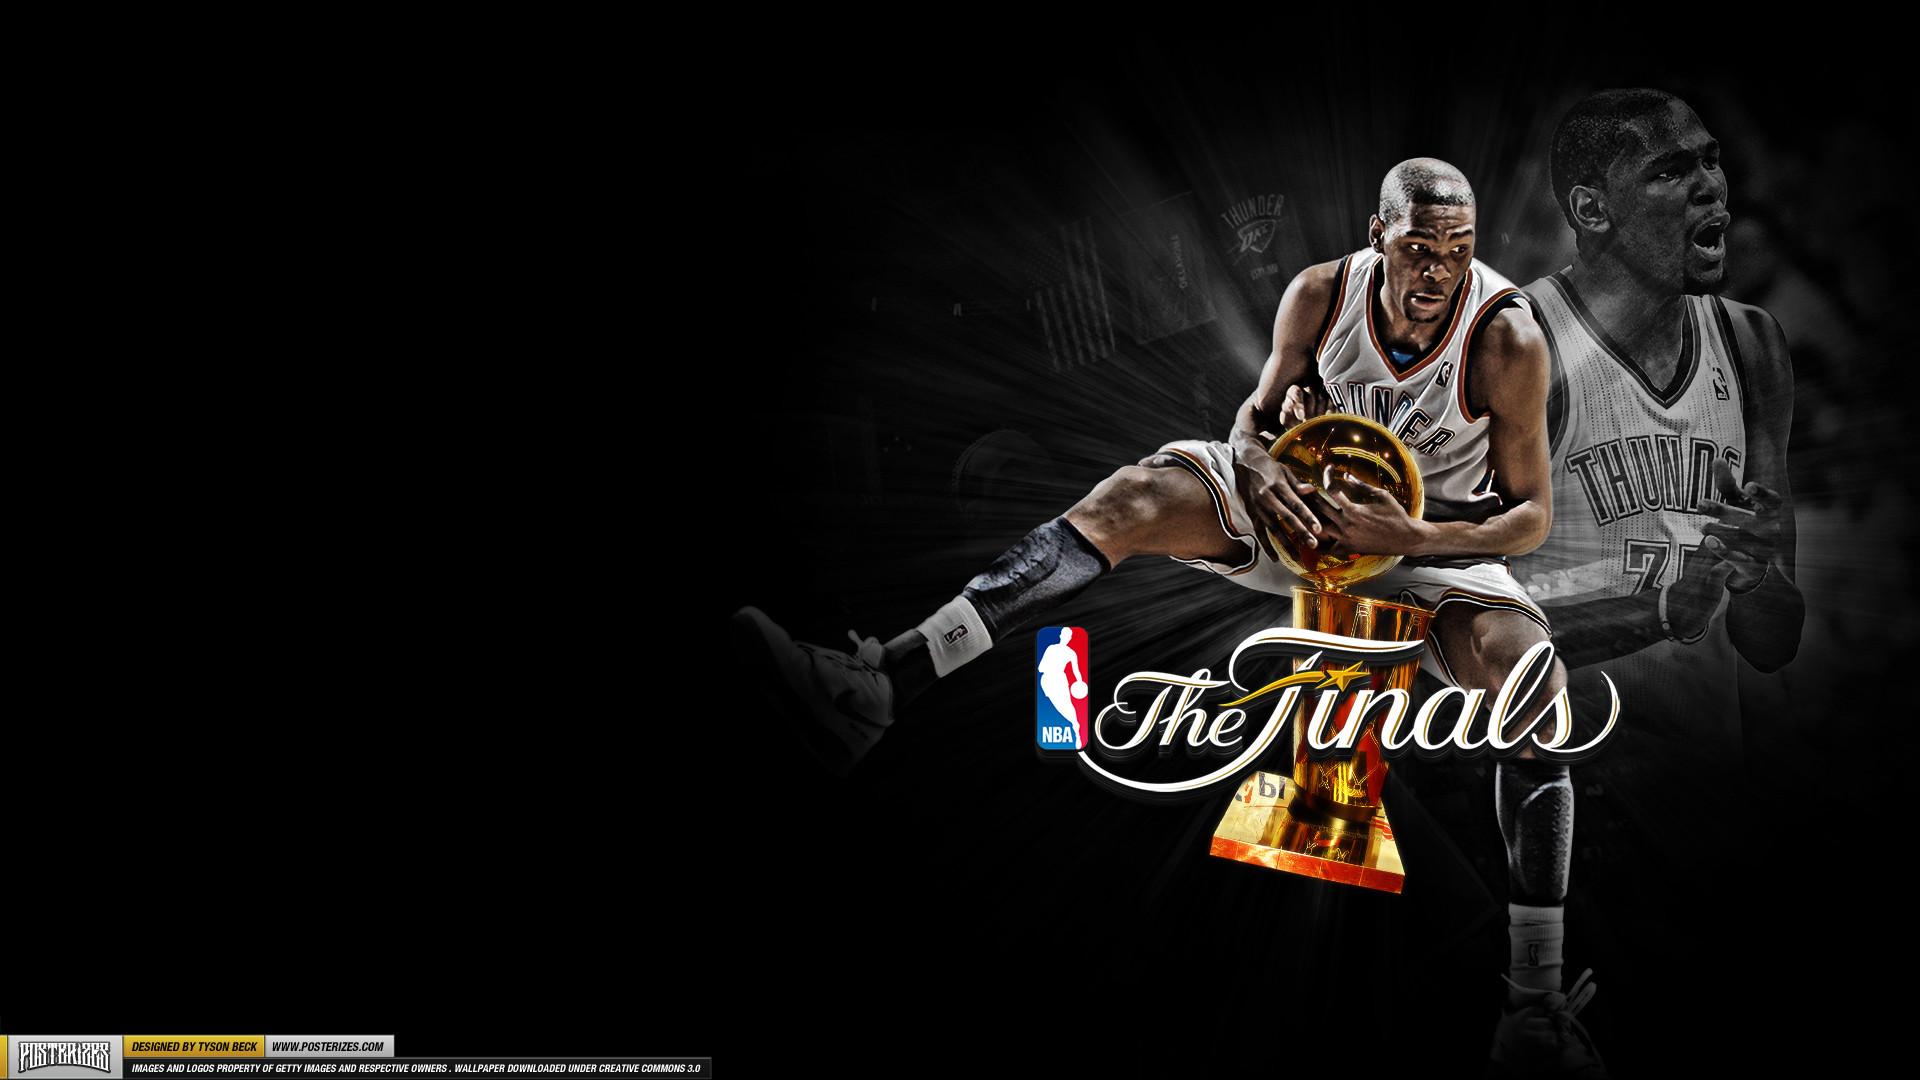 Nba Finals 2011 Game 2 Download | Basketball Scores